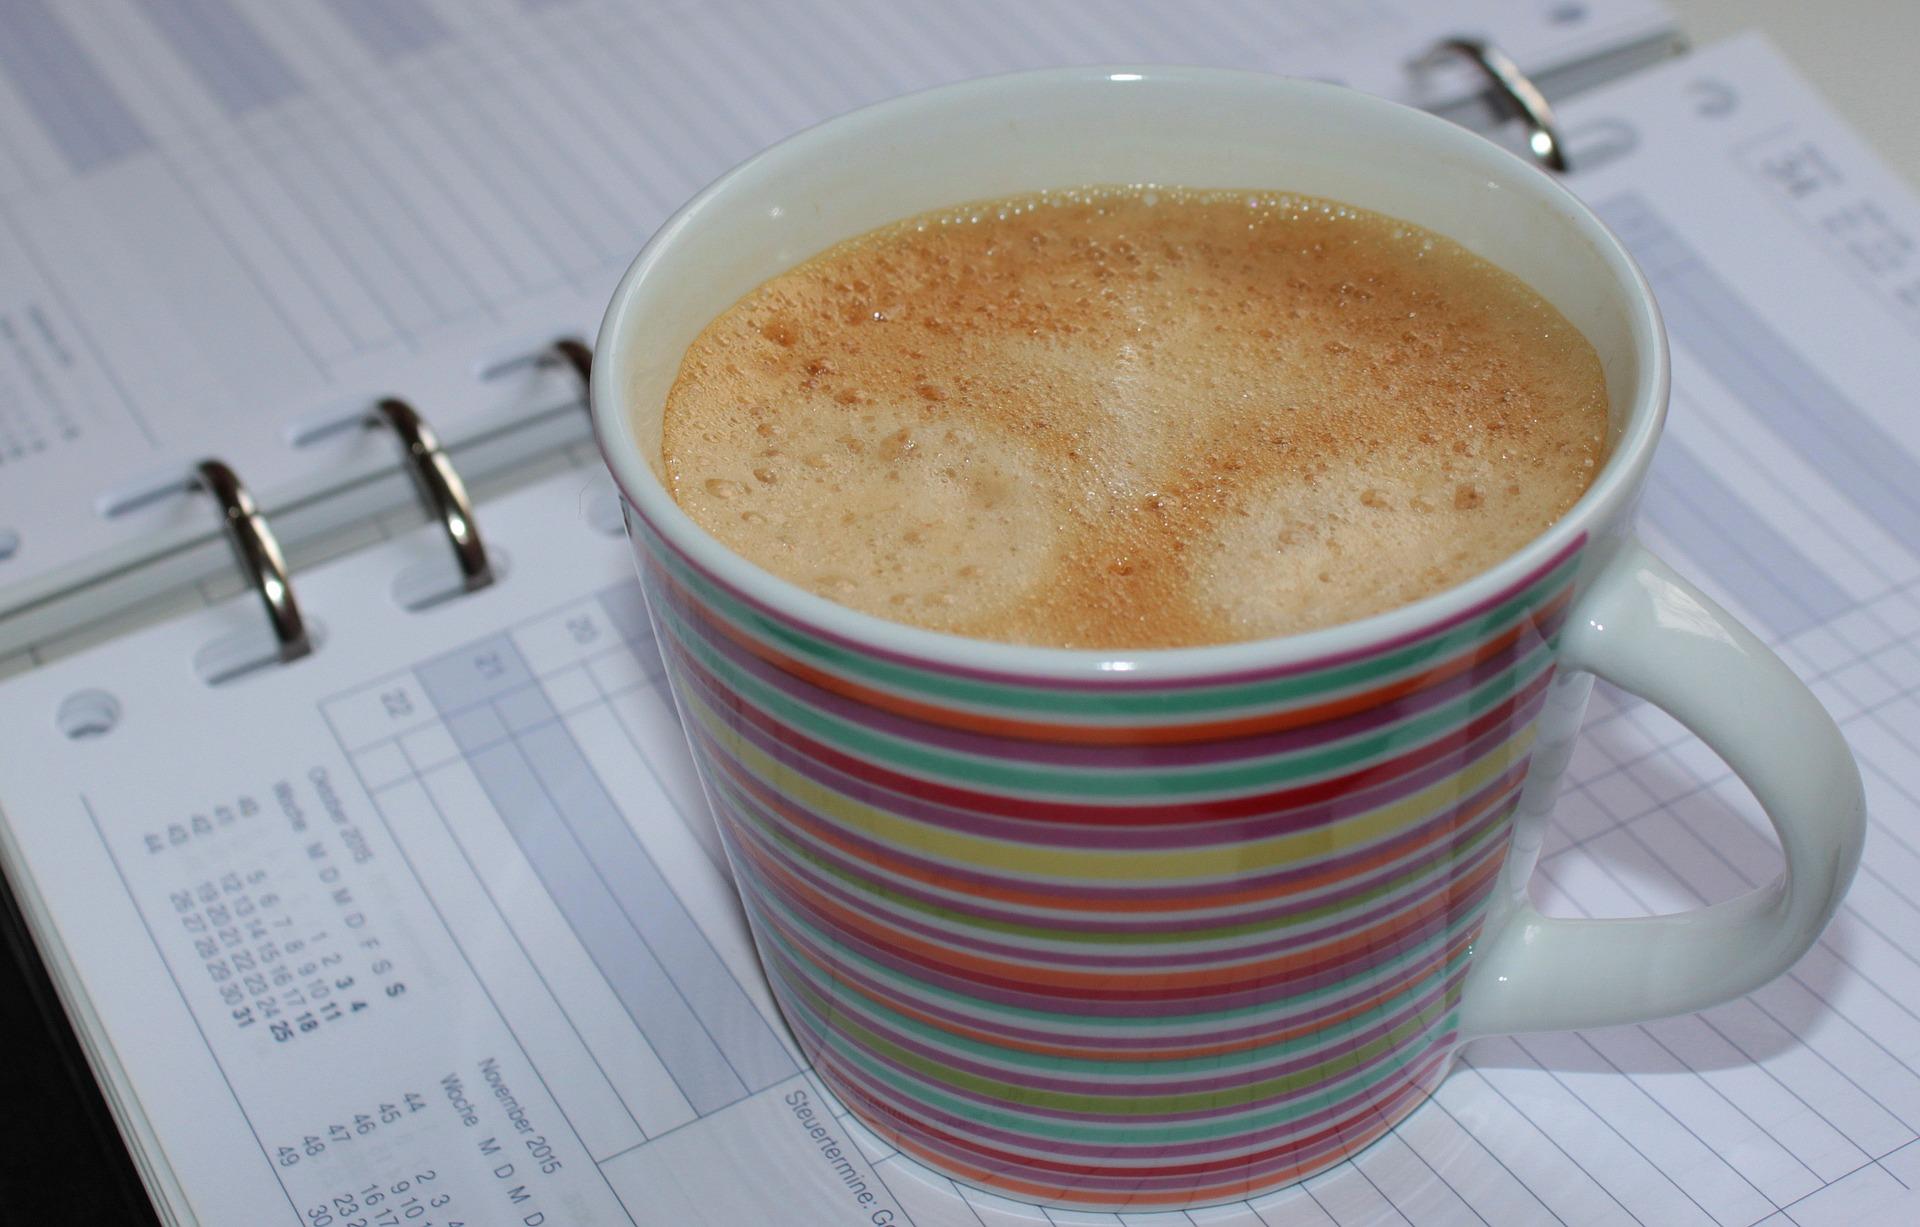 cup-of-coffee-1232719_1920.jpg